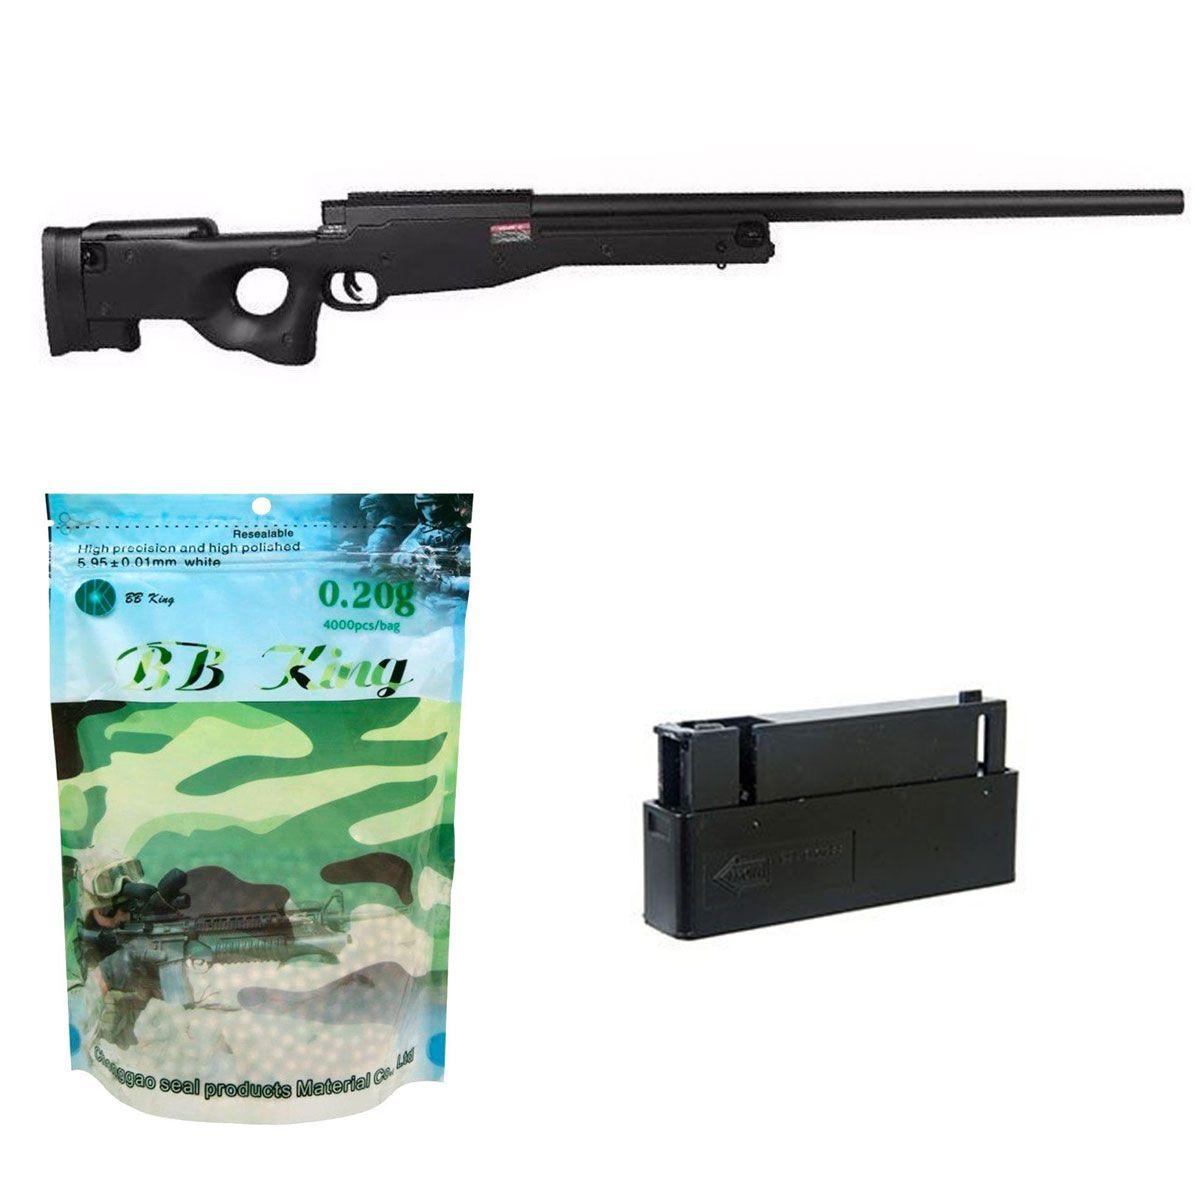 Kit Sniper Evo L96 Preto + BB King 0,20g + Mag Extra